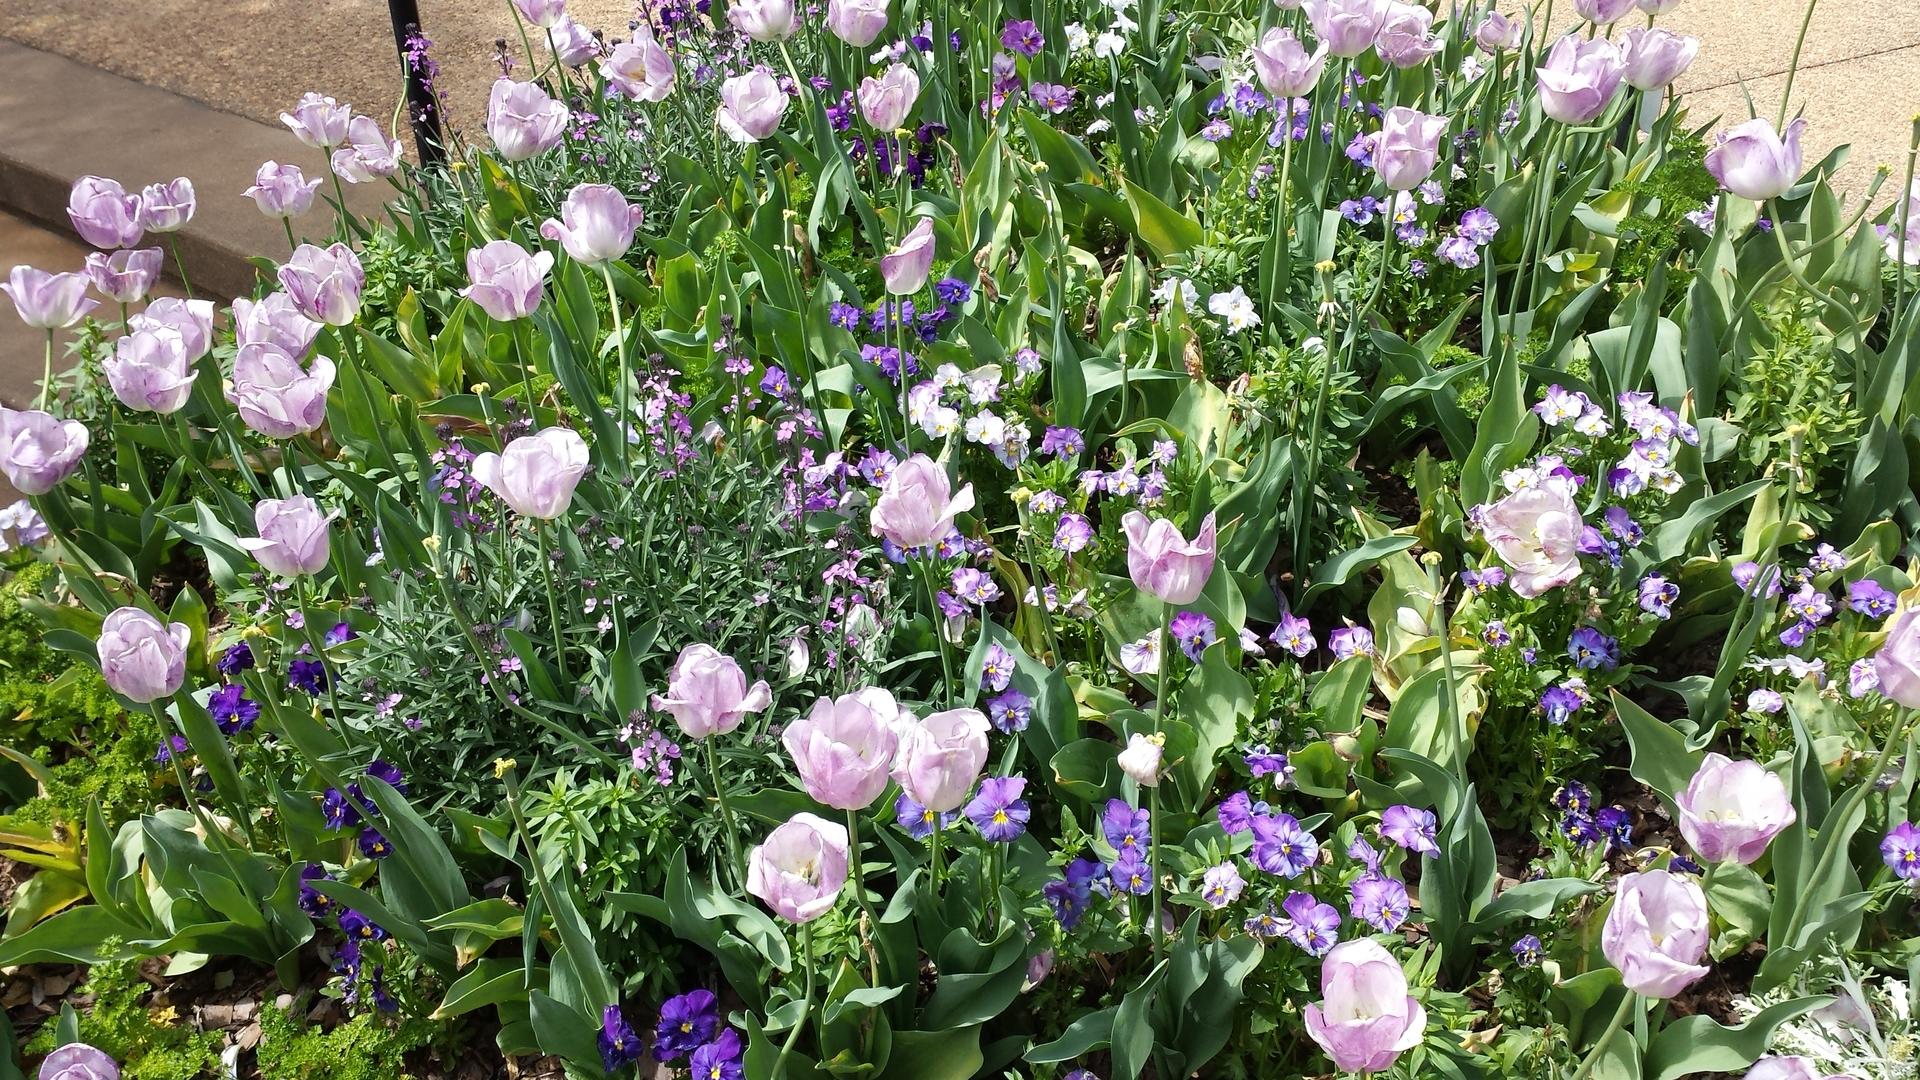 Flower, Flora, Garden, Nature, Blooming